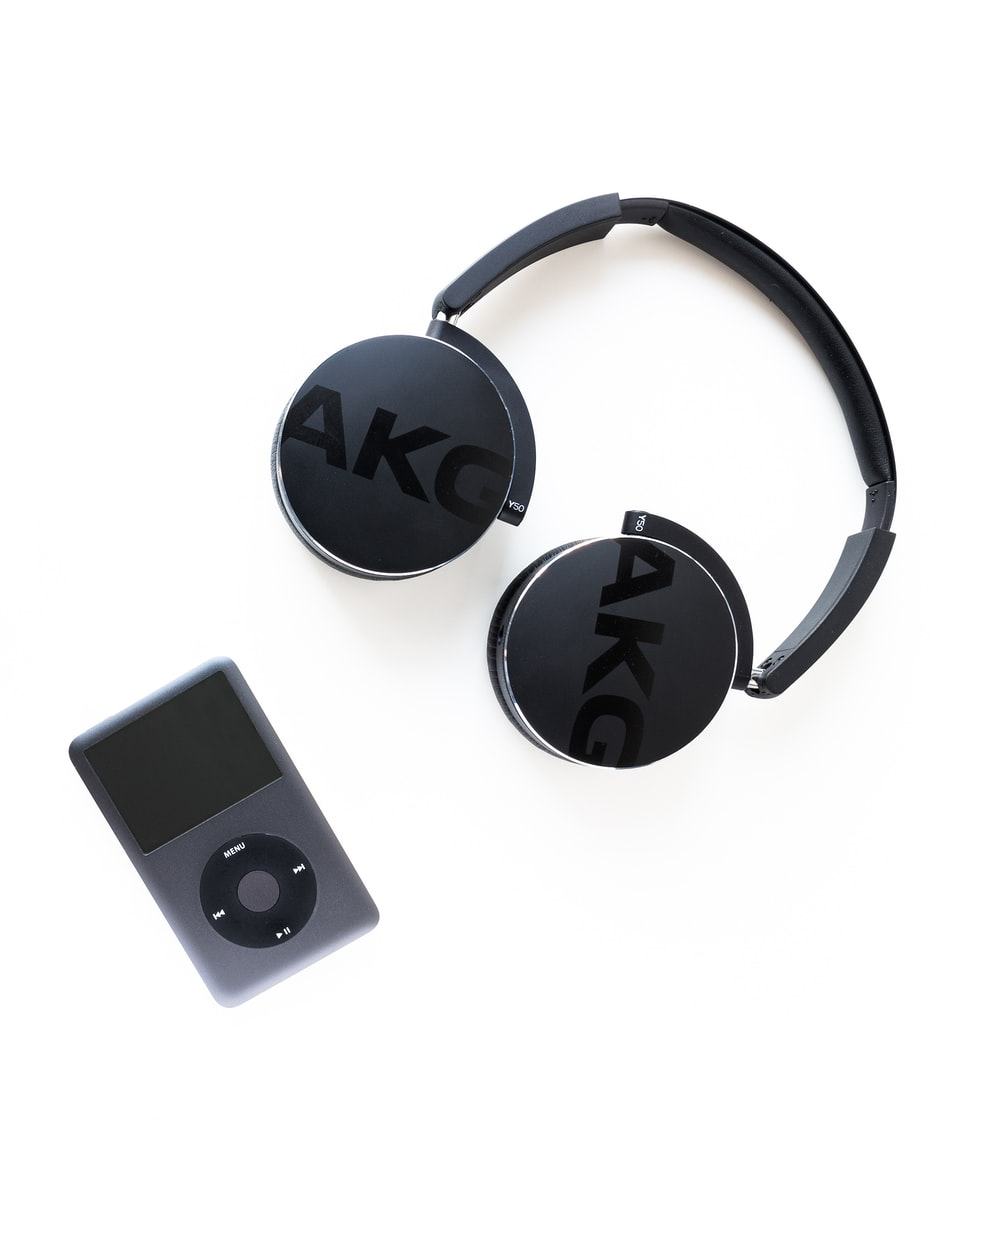 black AKG wireless headphones